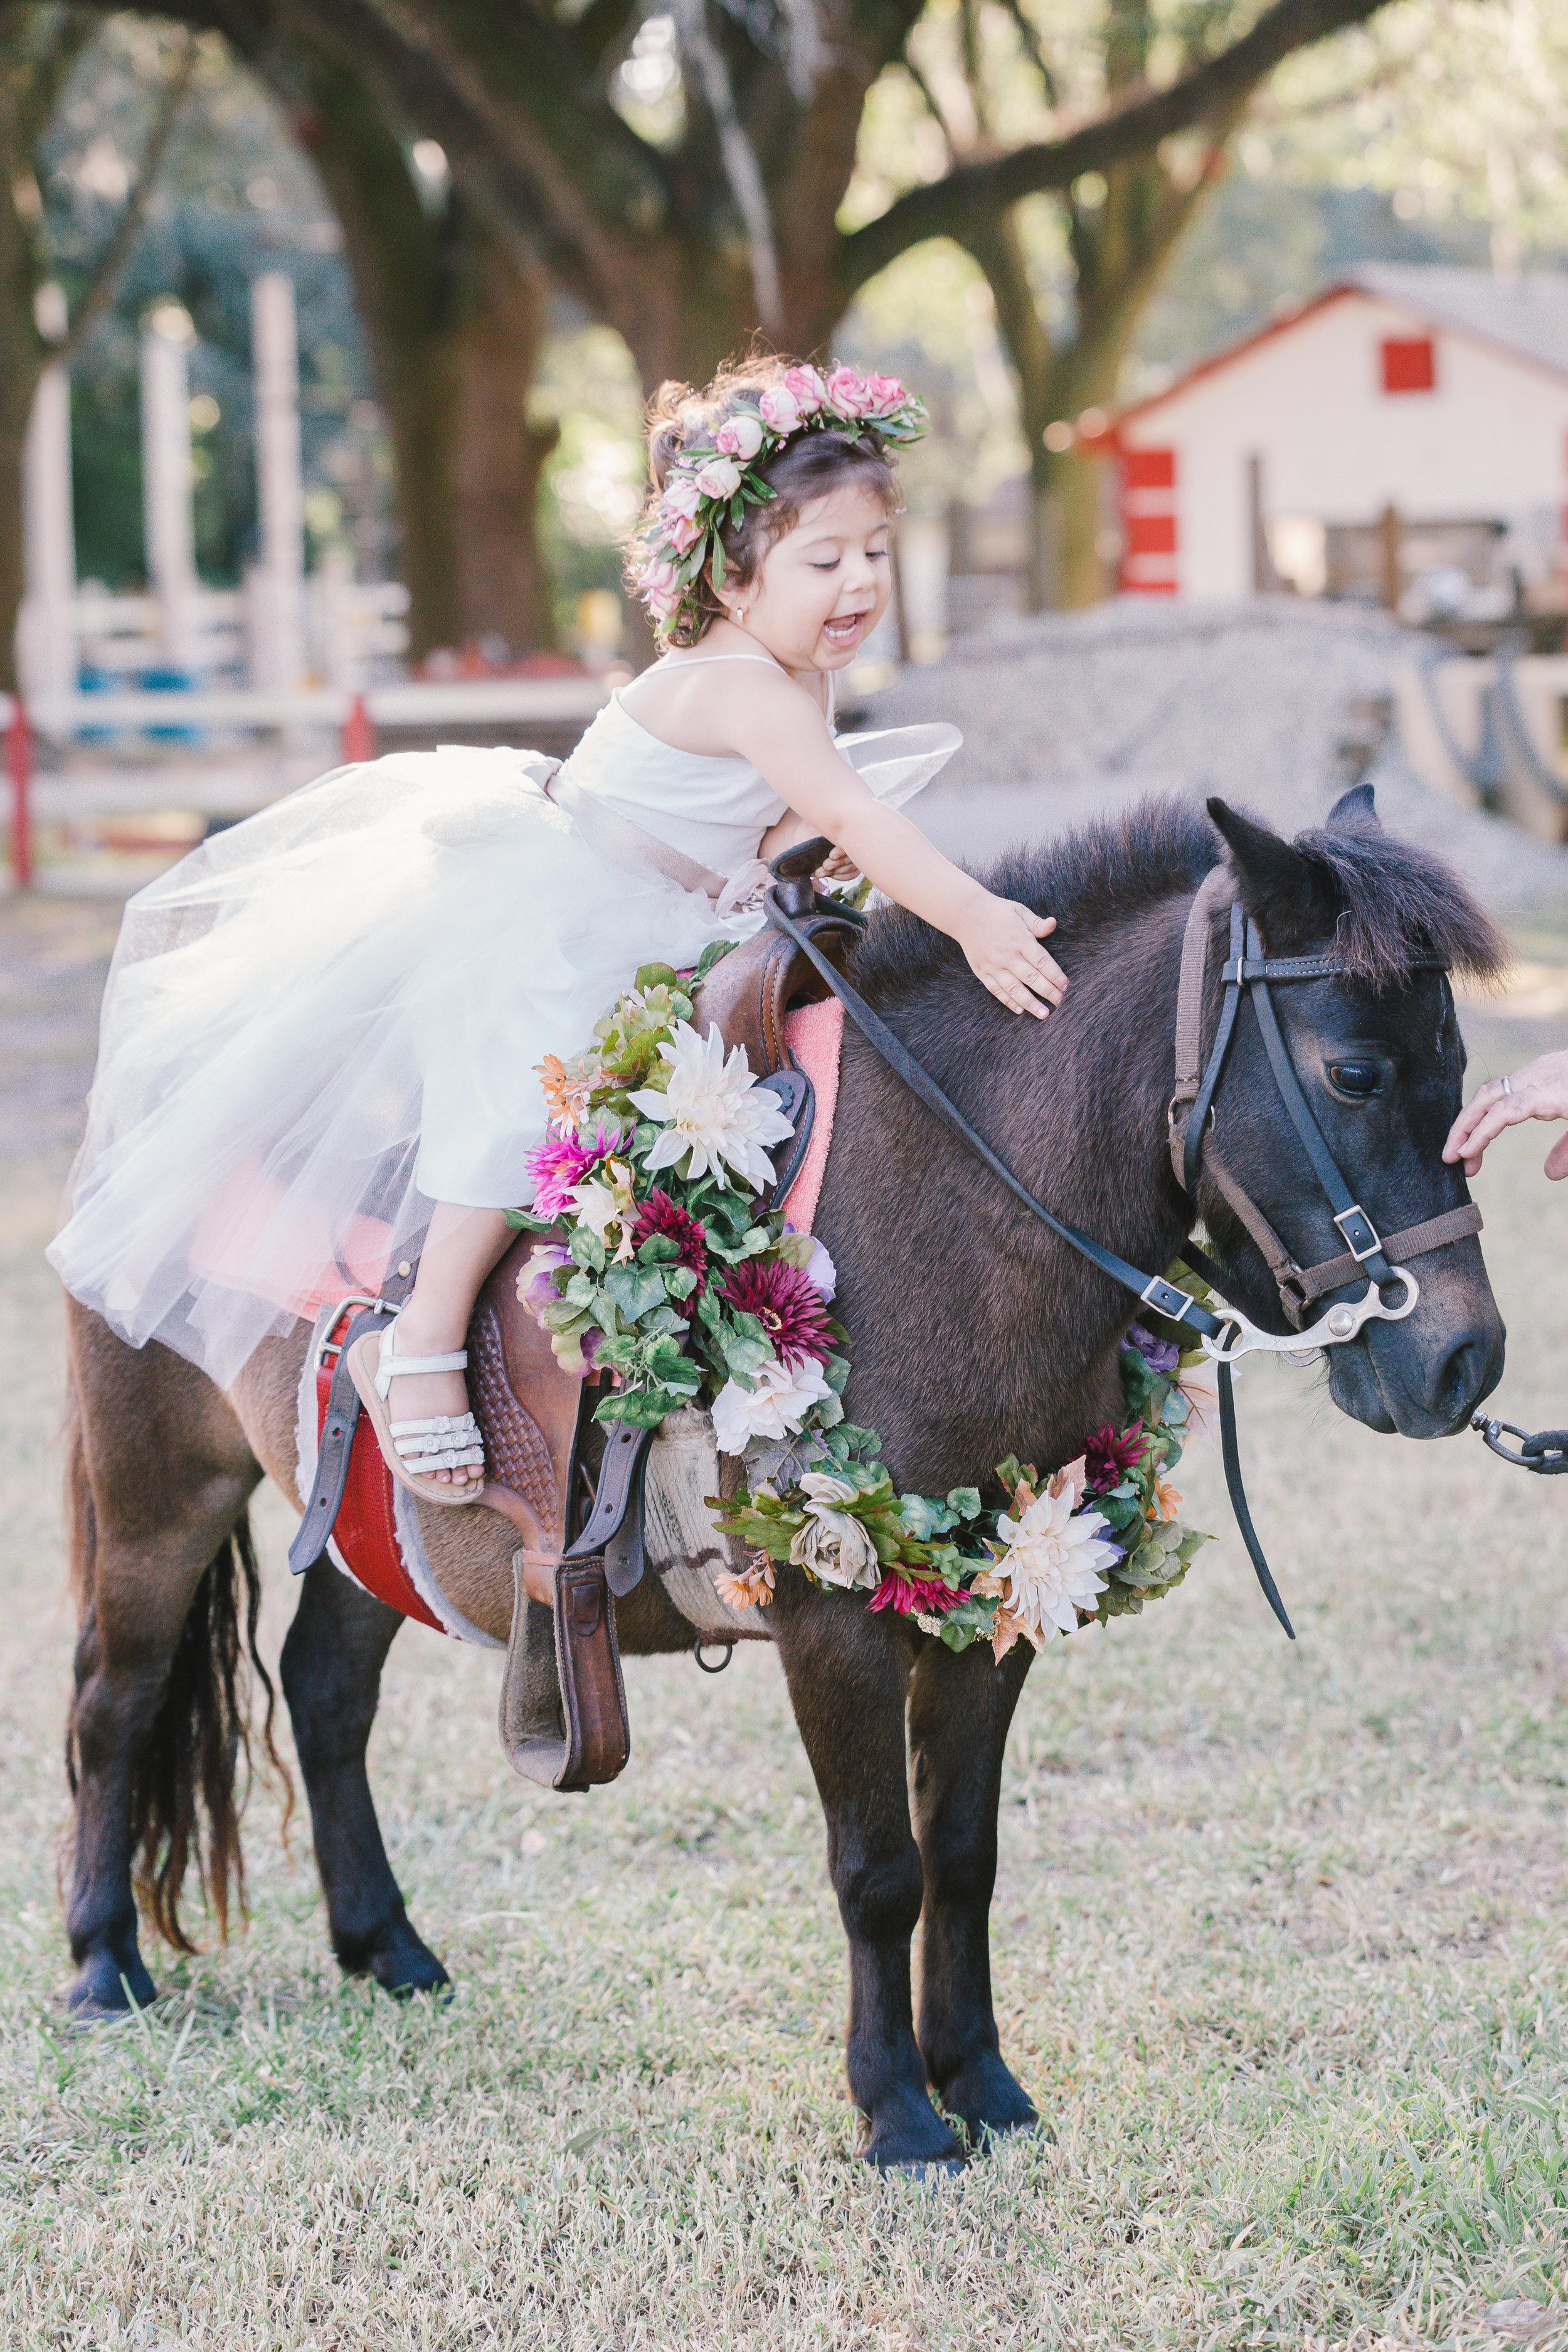 Magical Pony session, Tampa photographer, Tampa kids, Tampa wedding photographer